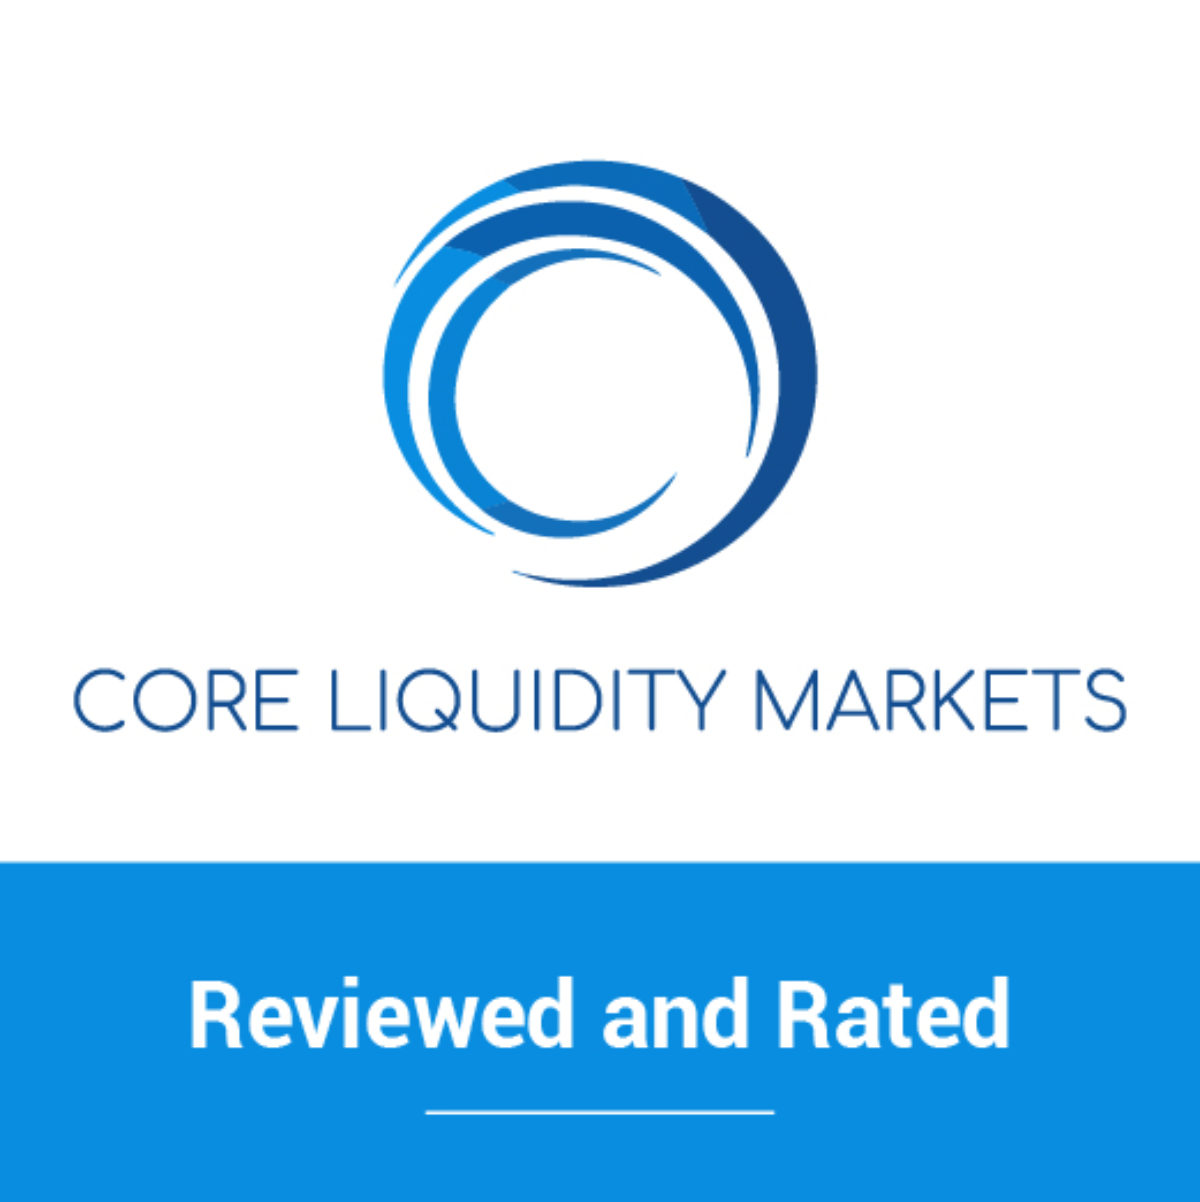 Core liquidity markets binary options florida pop warner betting